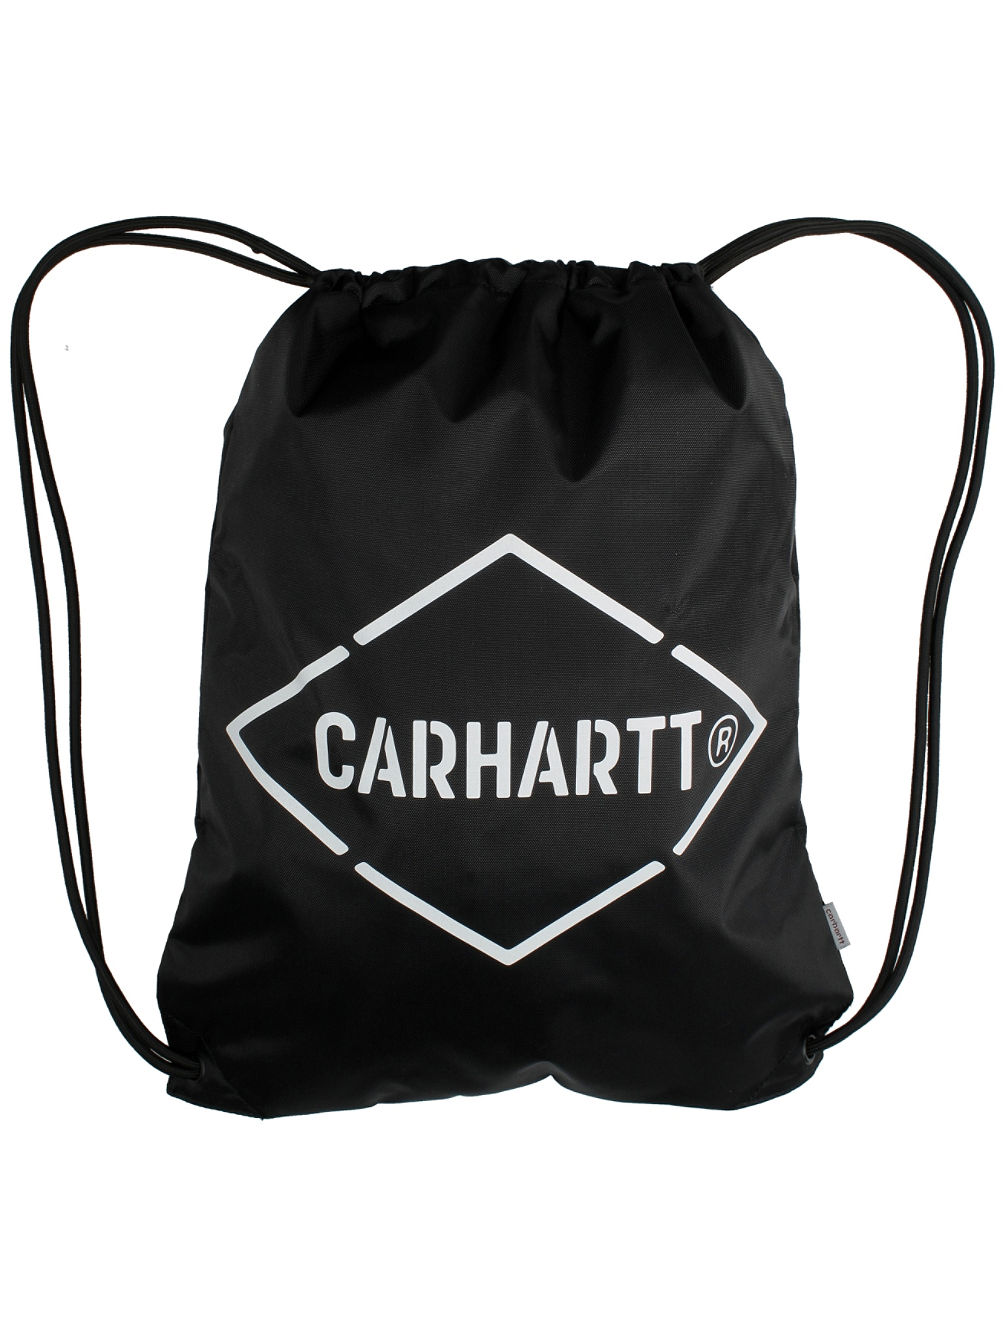 carhartt-wip-diamond-script-gymbag